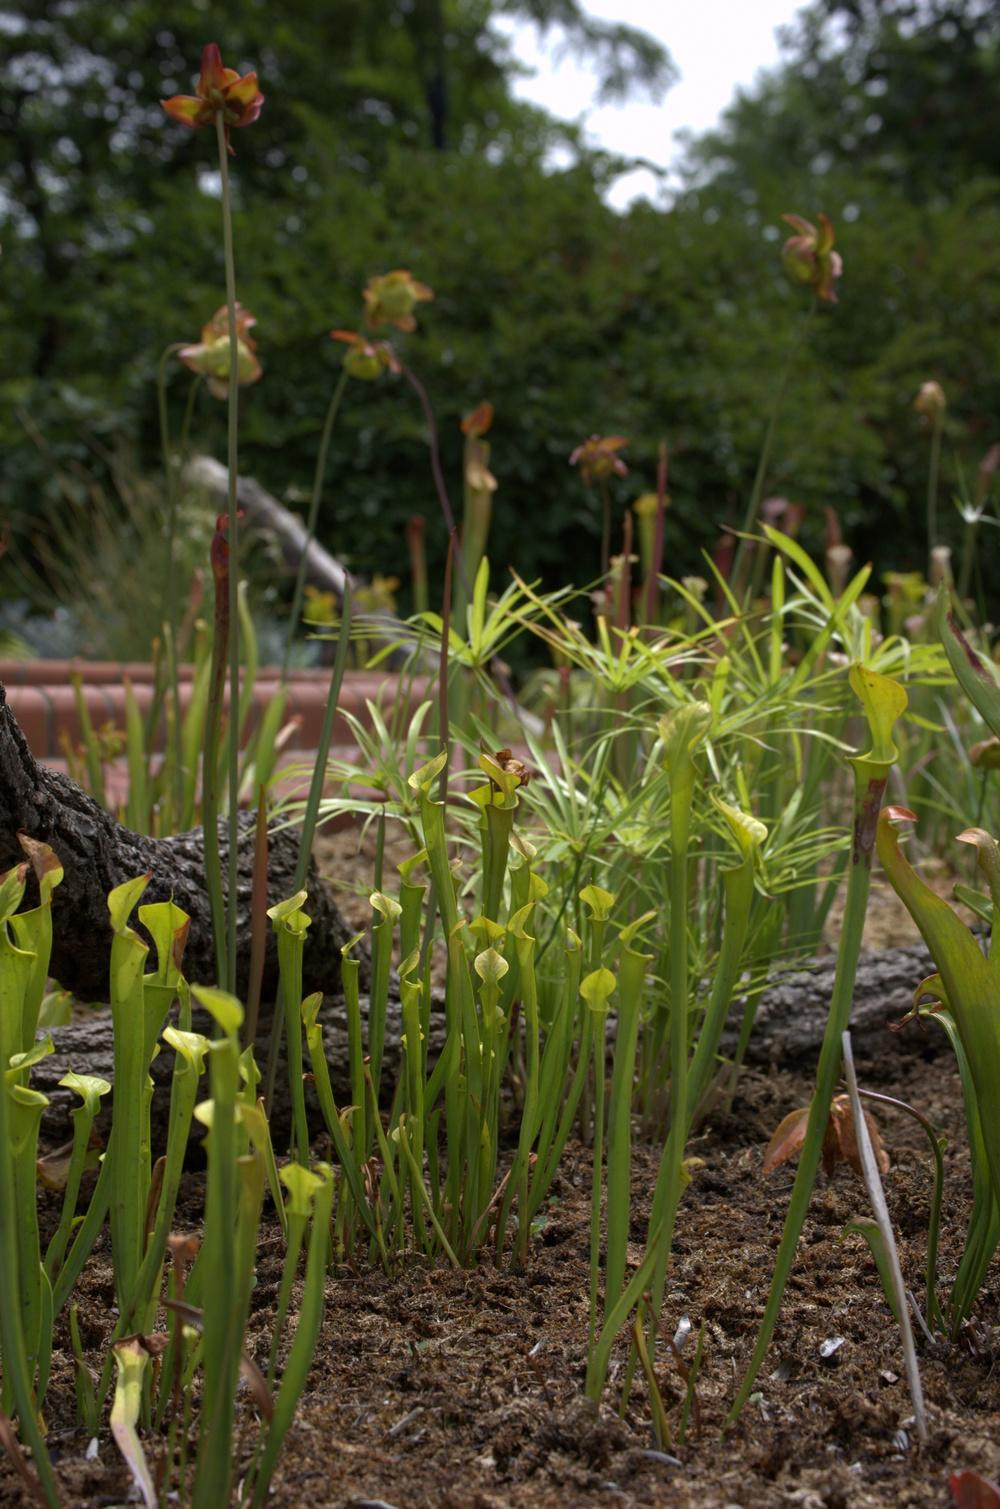 Sarracenia,Pitcher Plants